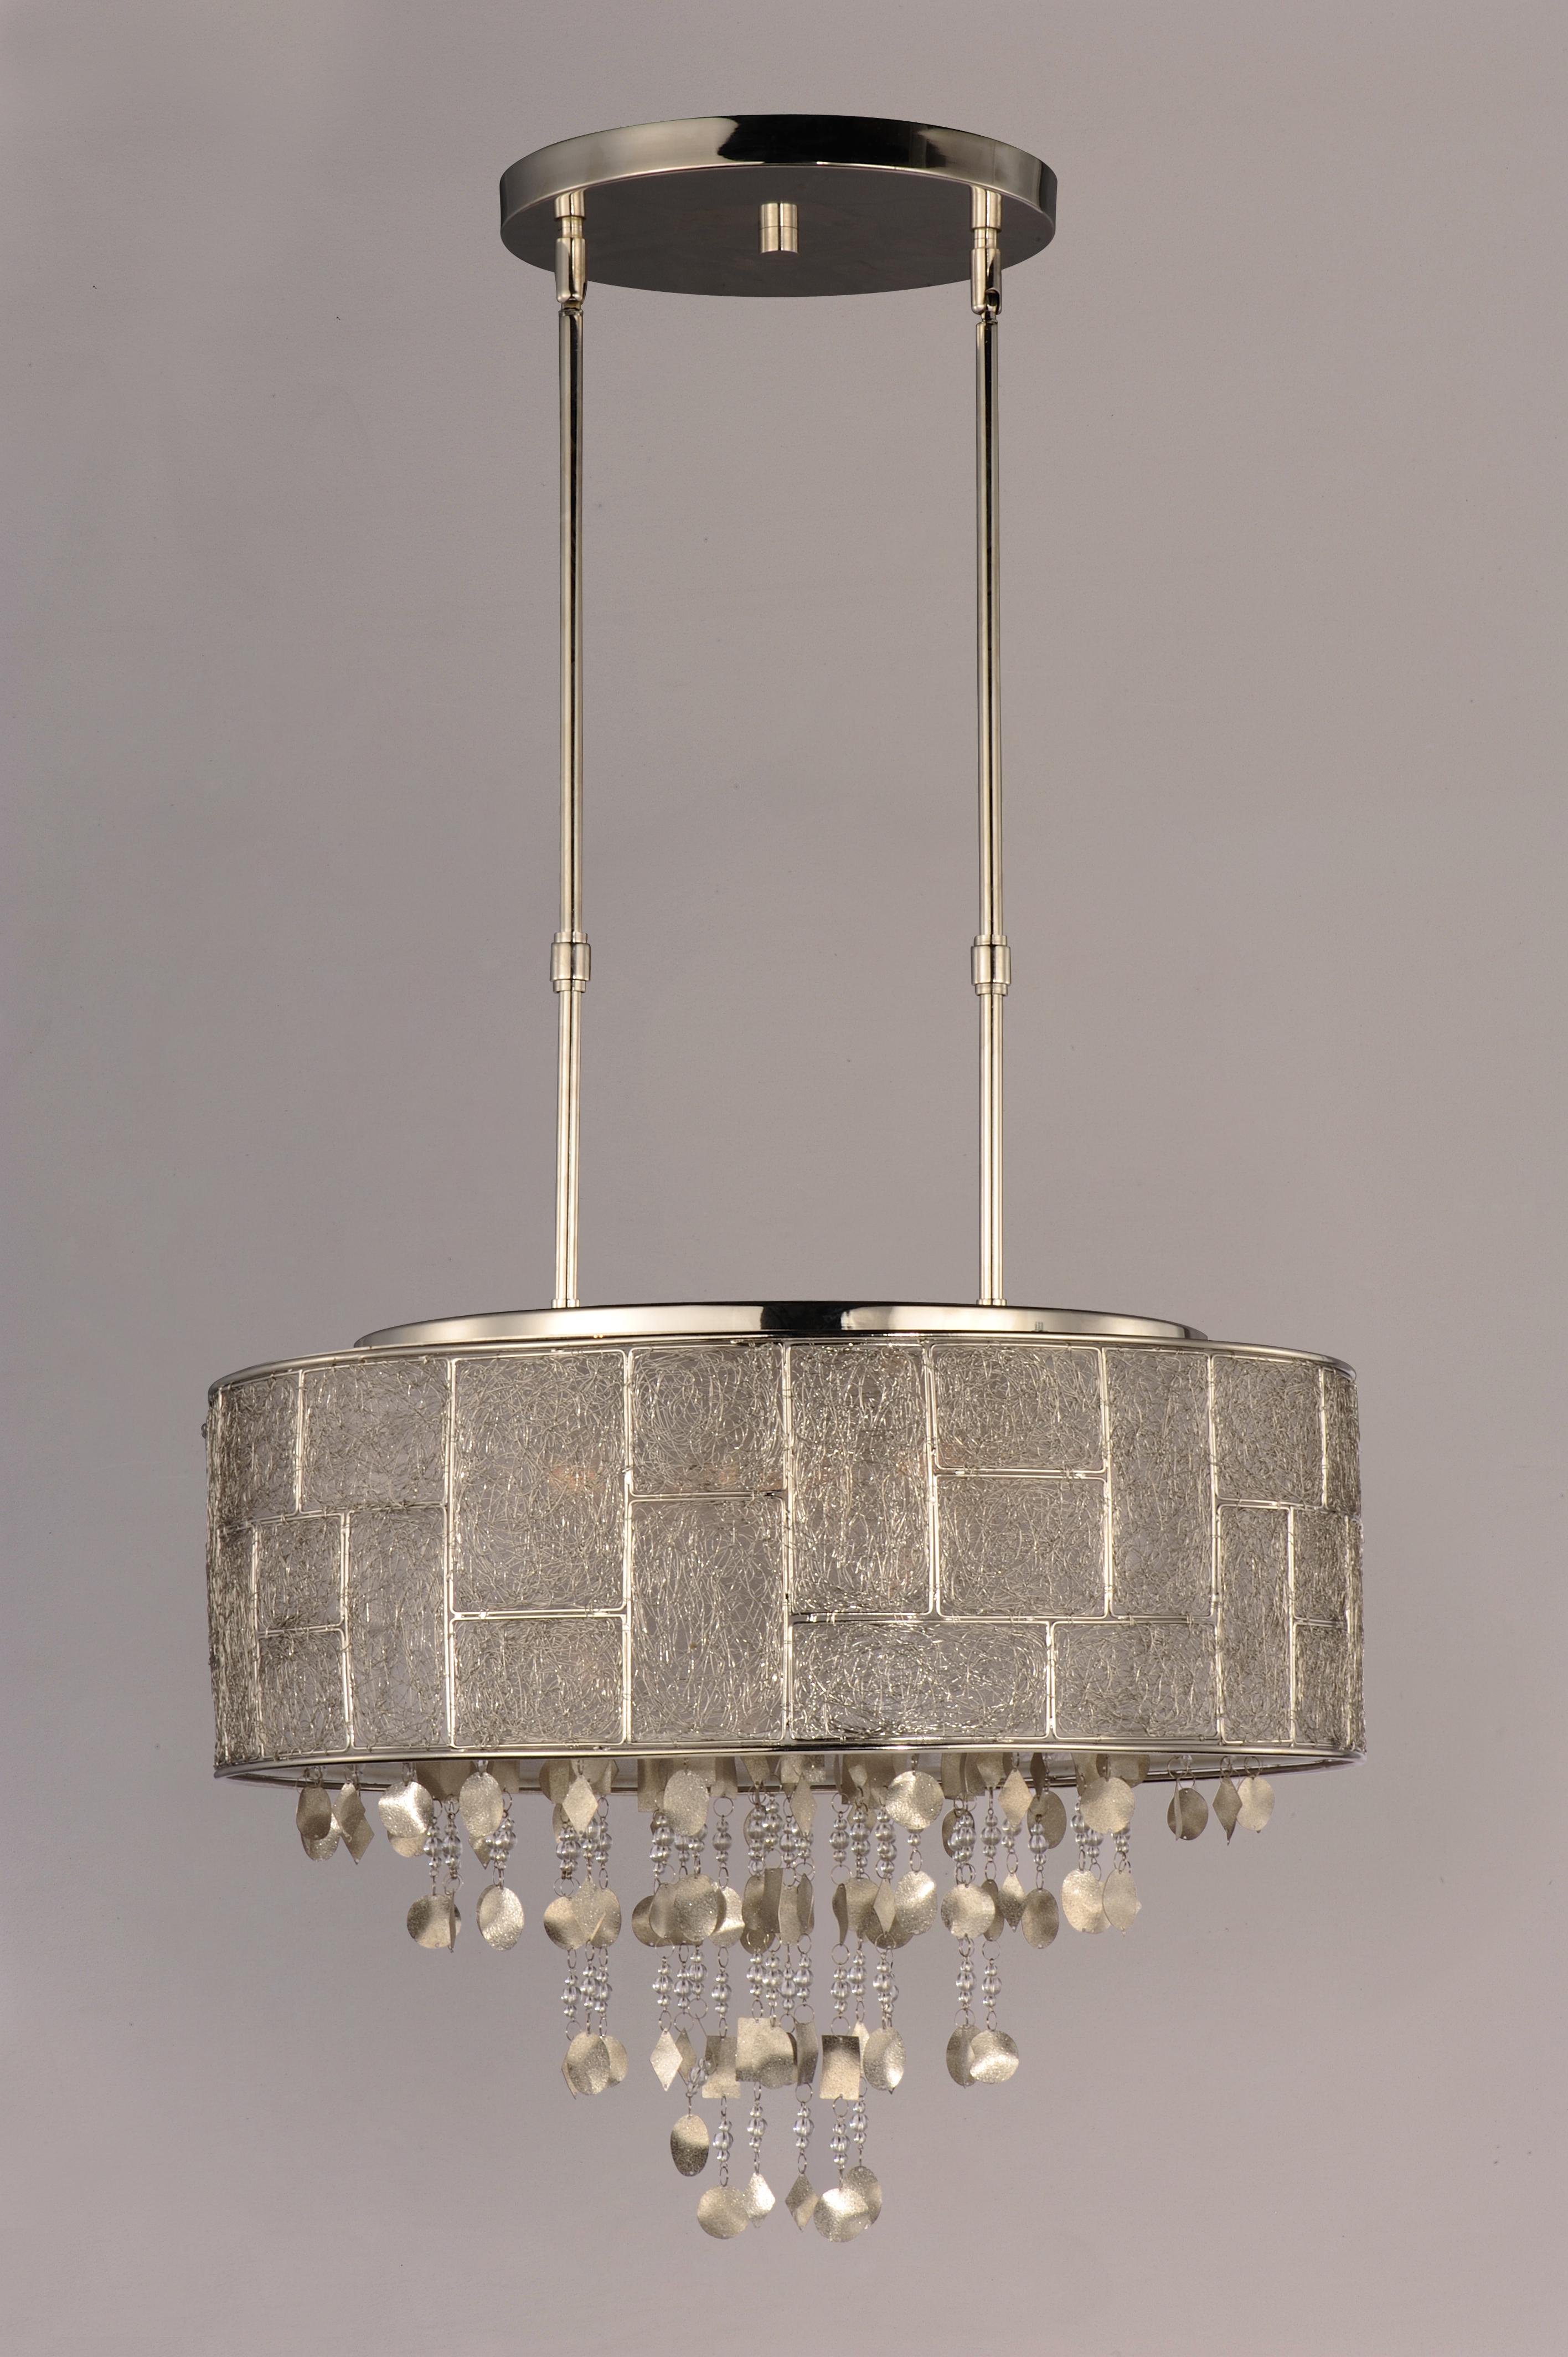 Allure · Allure 9-Light Pendant ... & Allure 9-Light Pendant - Single Pendant - Maxim Lighting